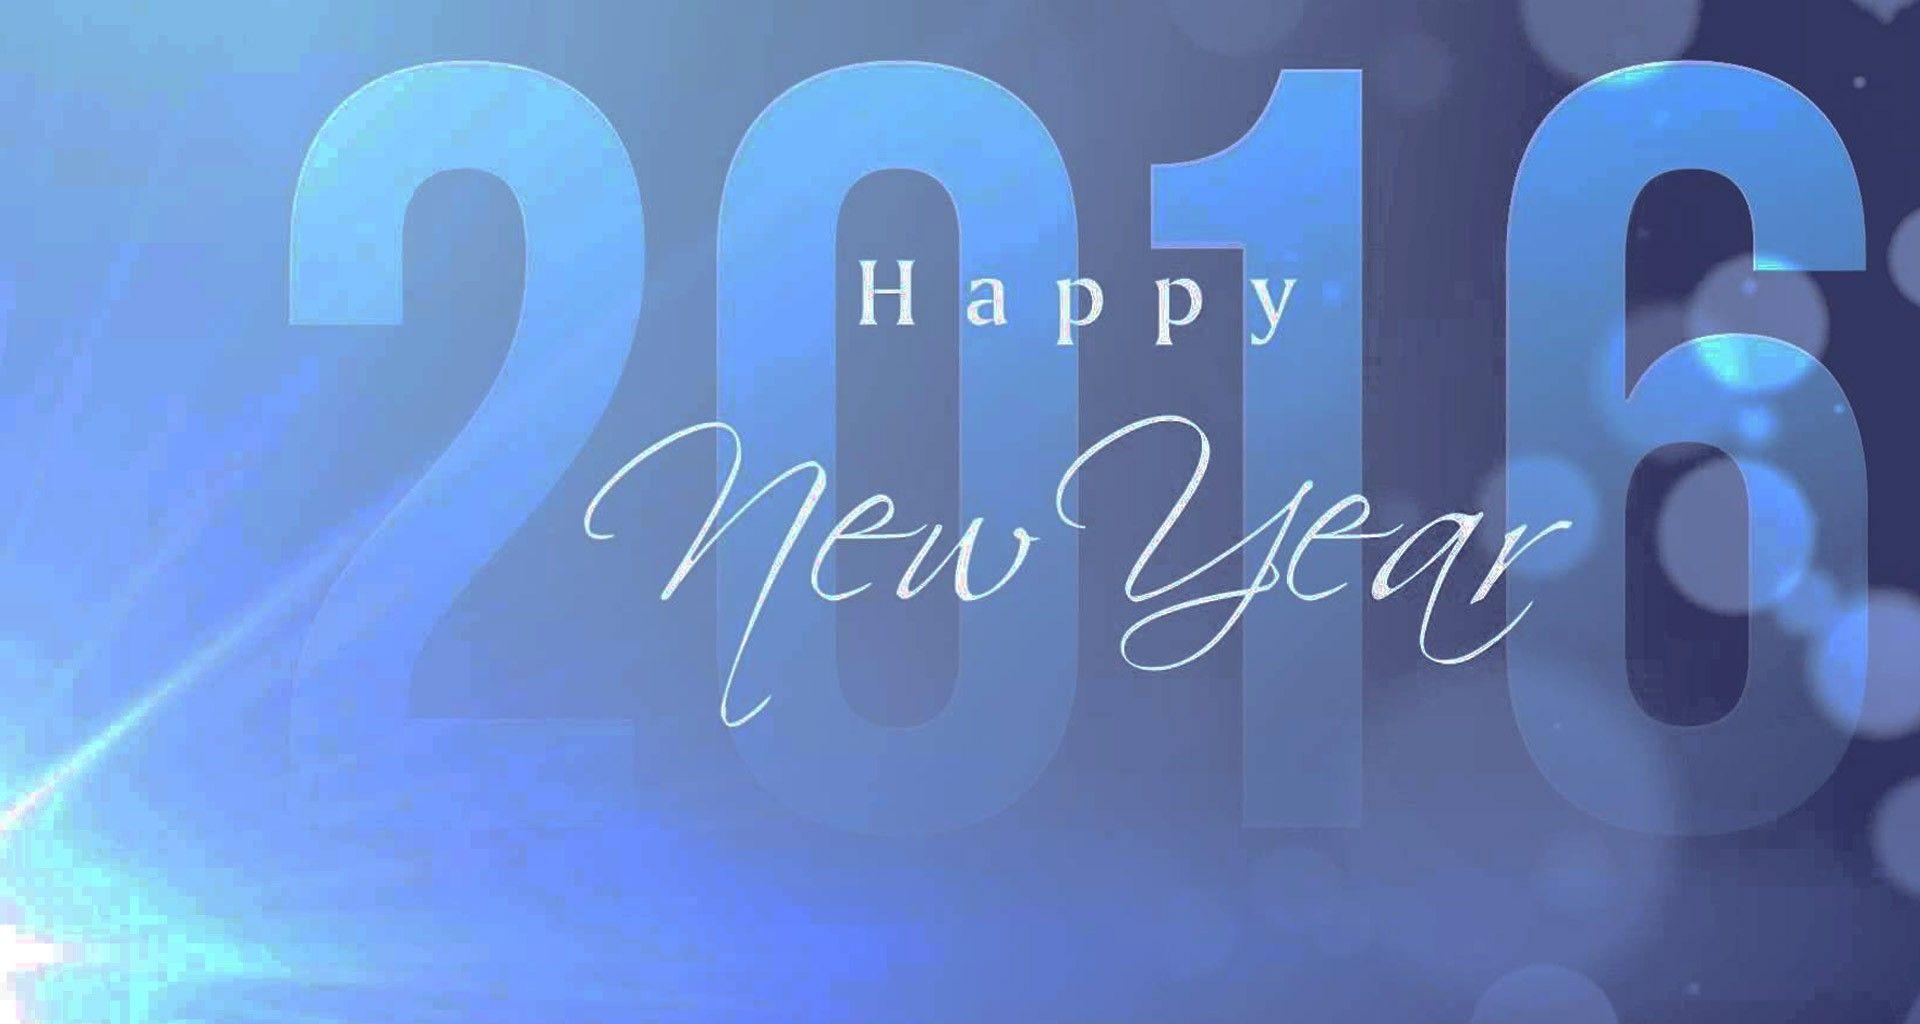 happy new year 2016 wallpaper for desktop